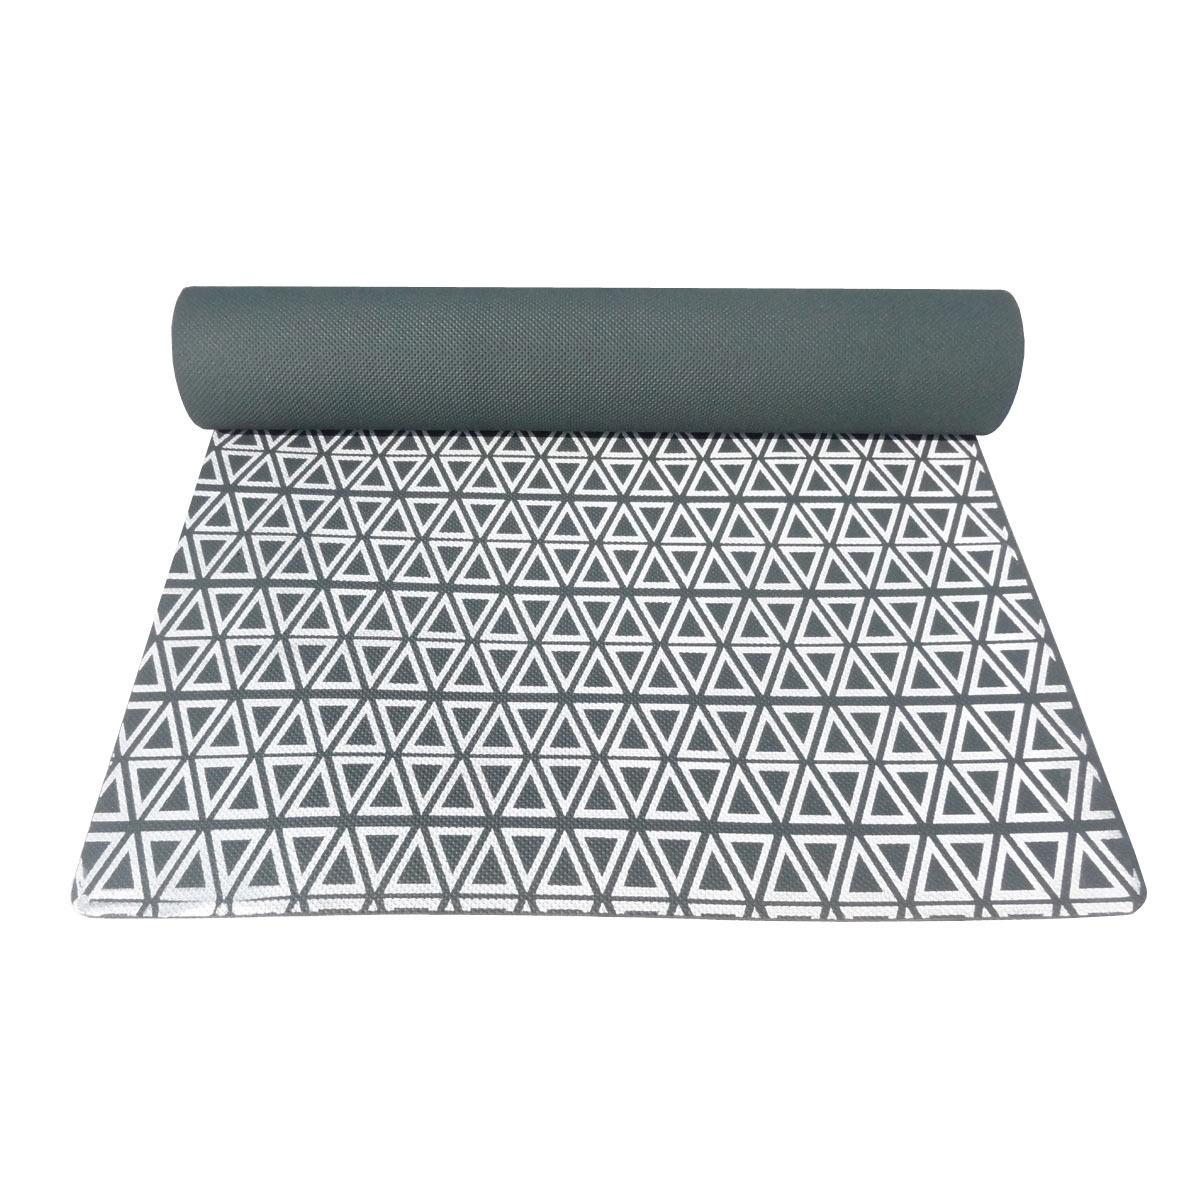 Triangle Print Yoga Mats